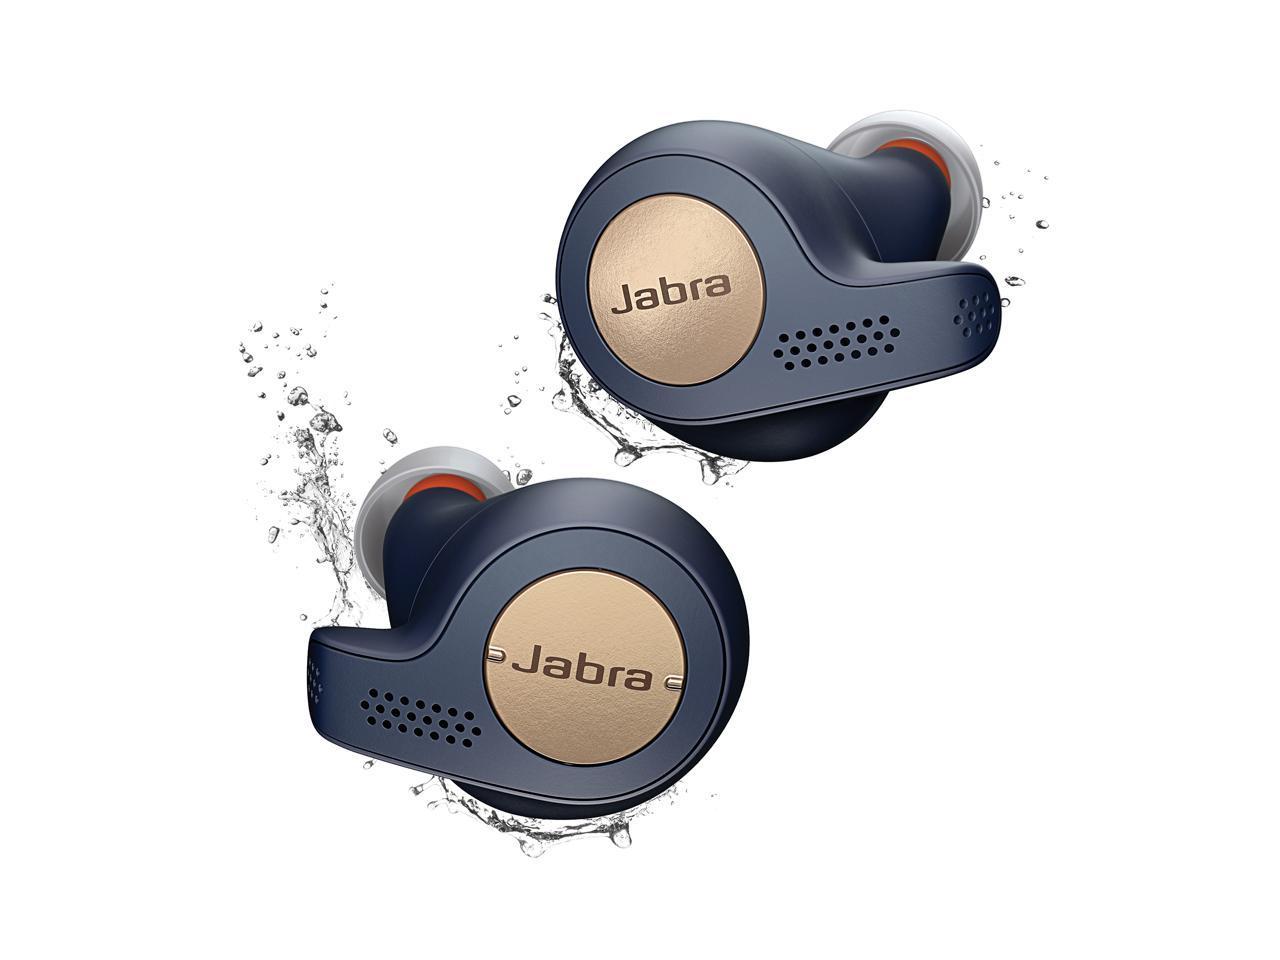 Jabra Elite Active 65t True Wireless Earbuds (Manufacturer Refurbished) $44.99 shipped free at Target or Newegg